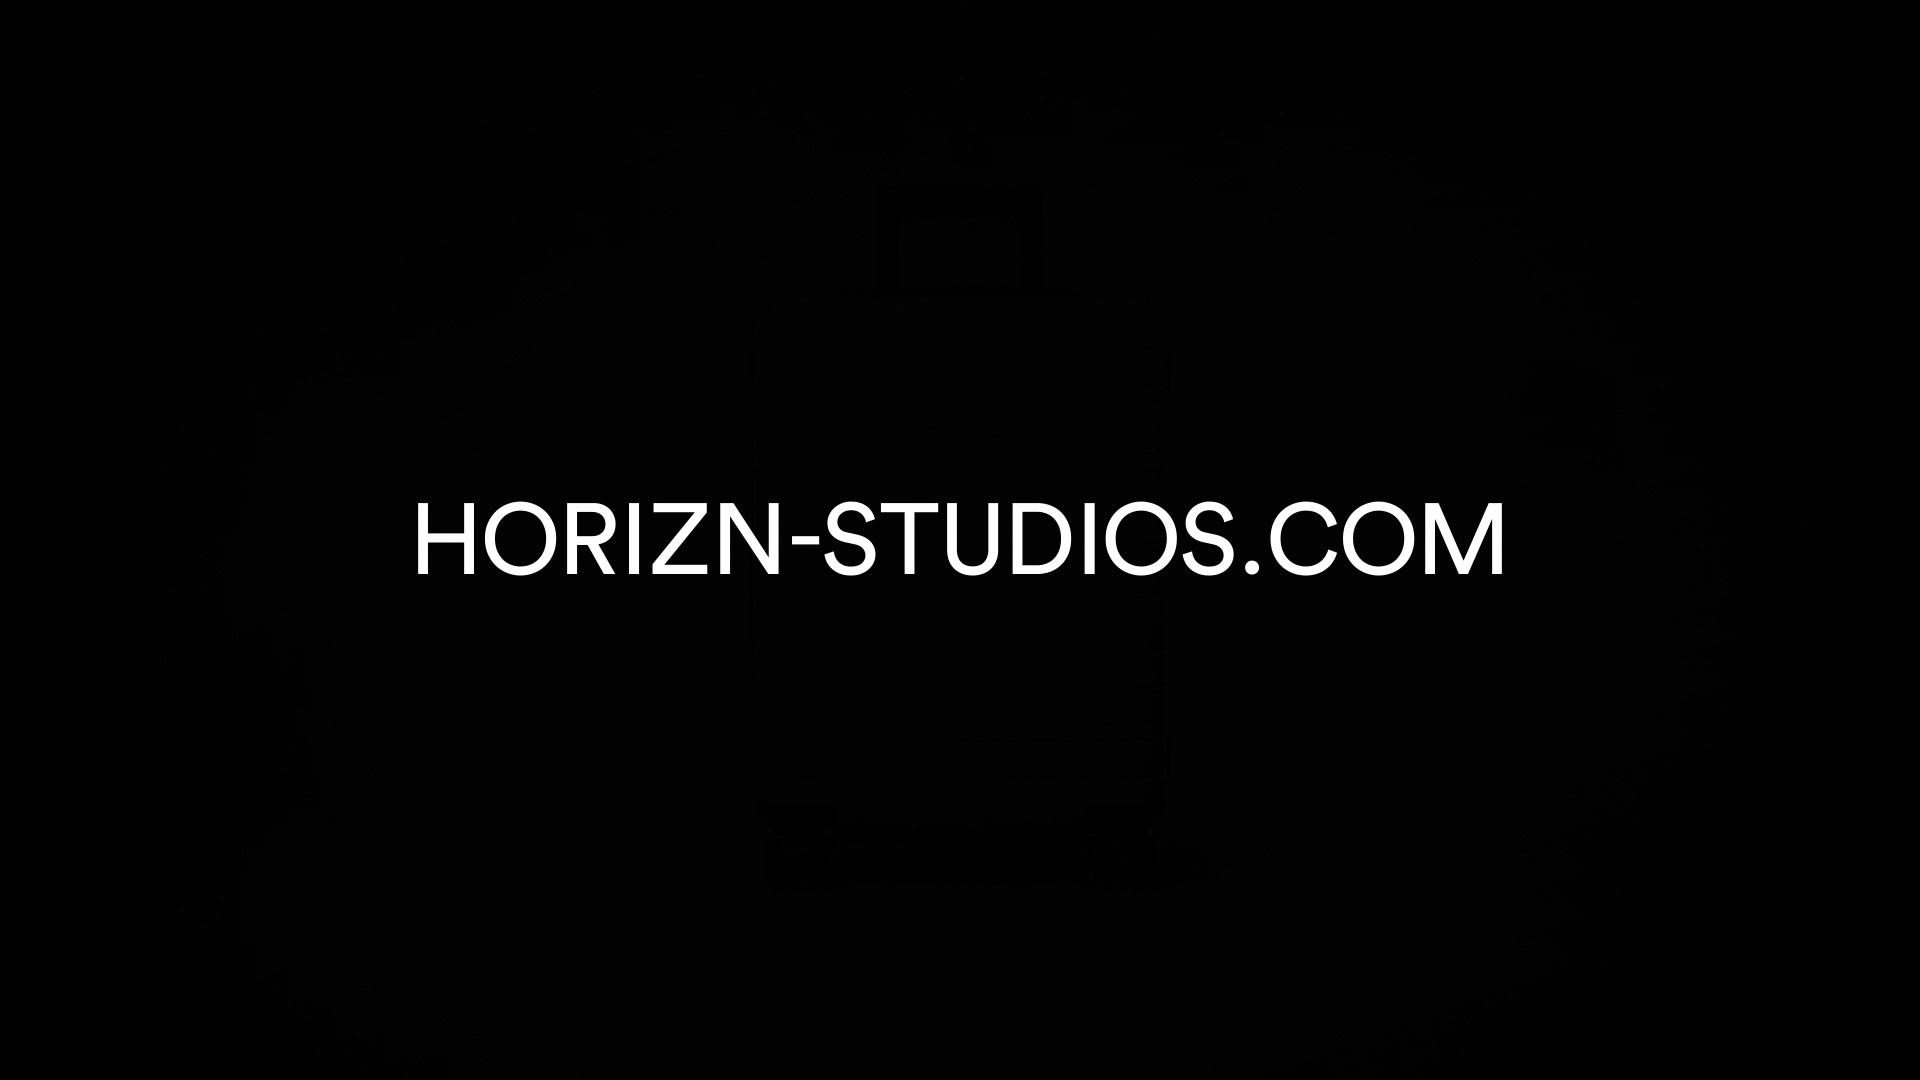 blokstudio_horizn_studios_galllery_02